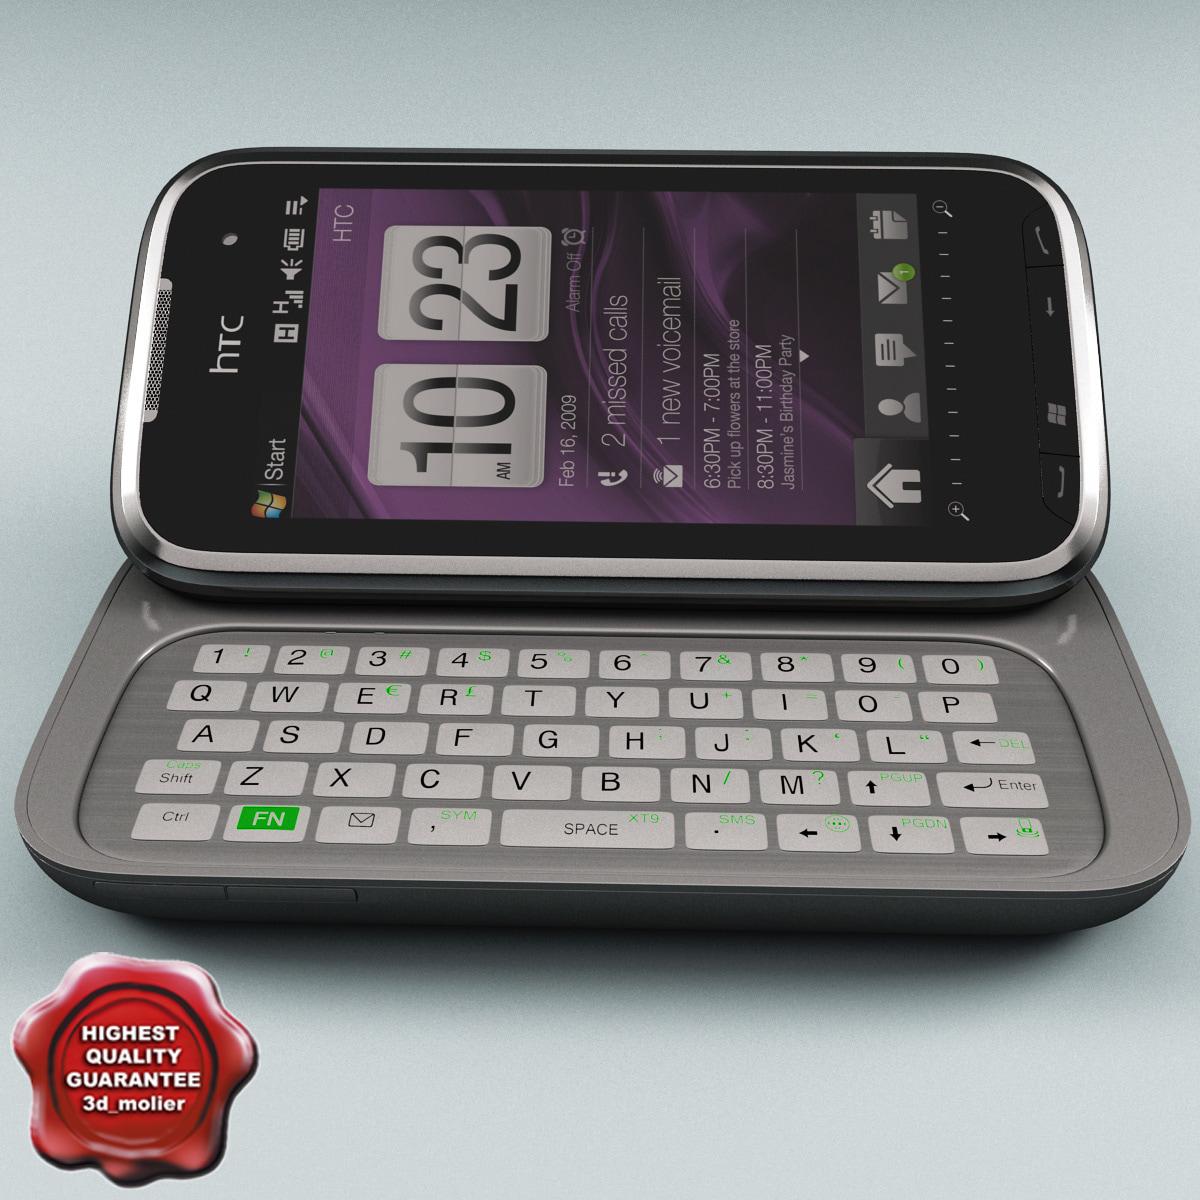 HTC_Touch_Pro_2_00.jpg